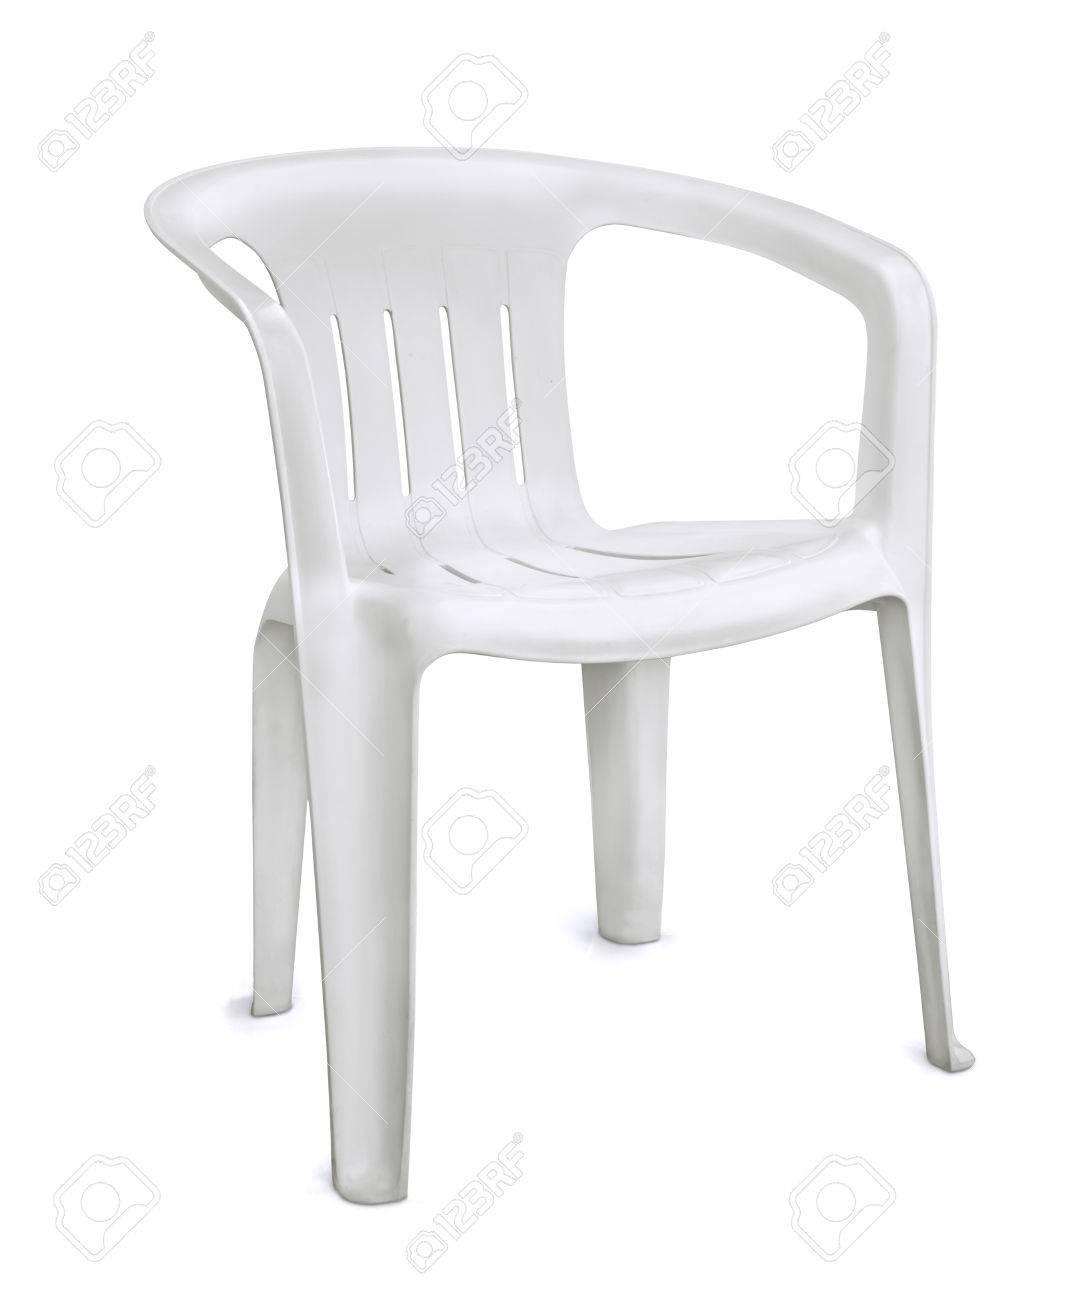 stuhl weiß kunststoff